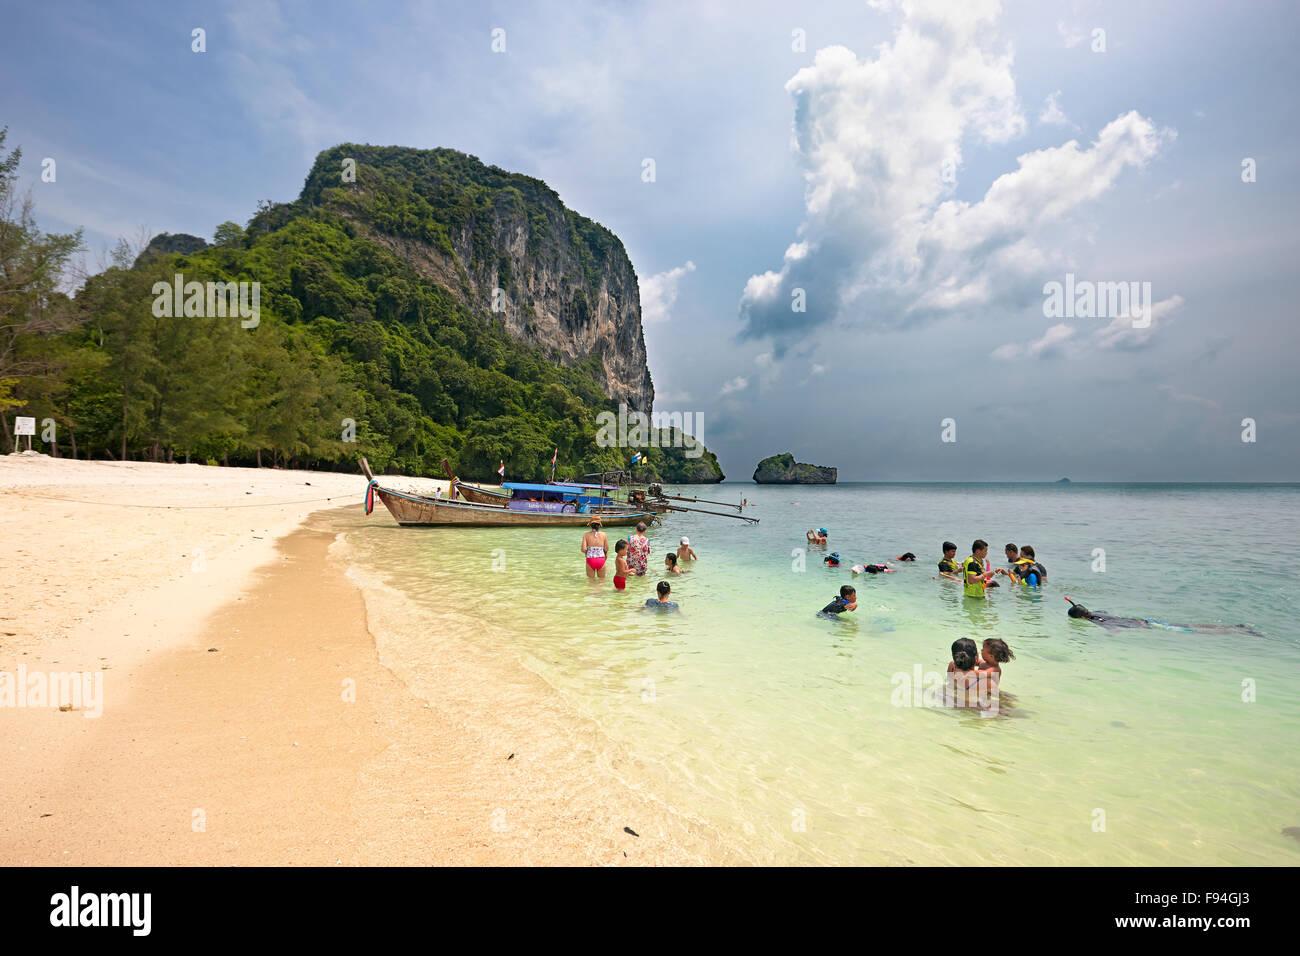 Beach on Poda Island (Koh Poda). Krabi Province, Thailand. - Stock Image